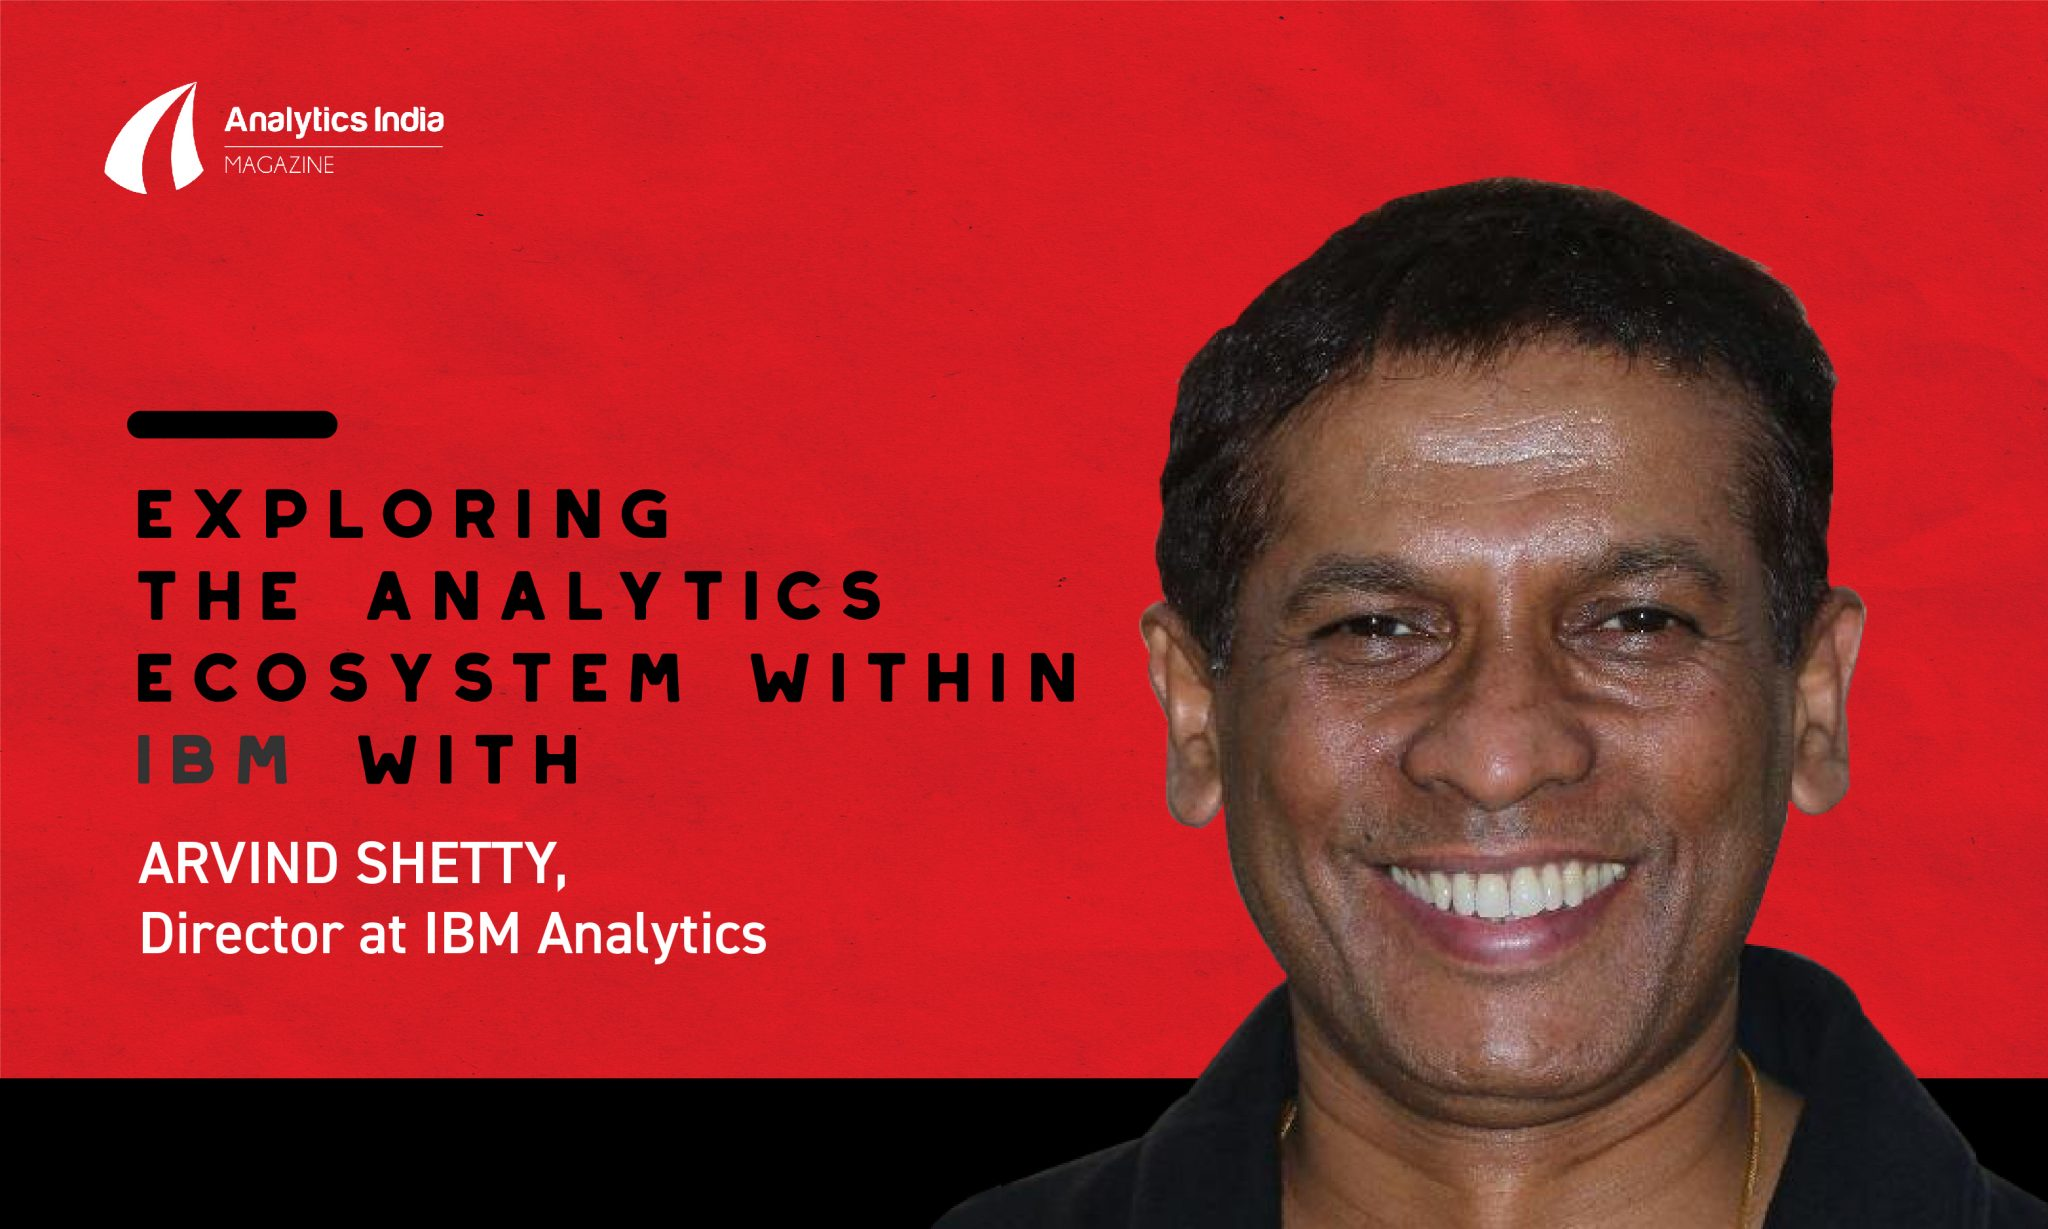 Exploring the Analytics ecosystem within IBM with Arvind Shetty, Director at IBM Analytics